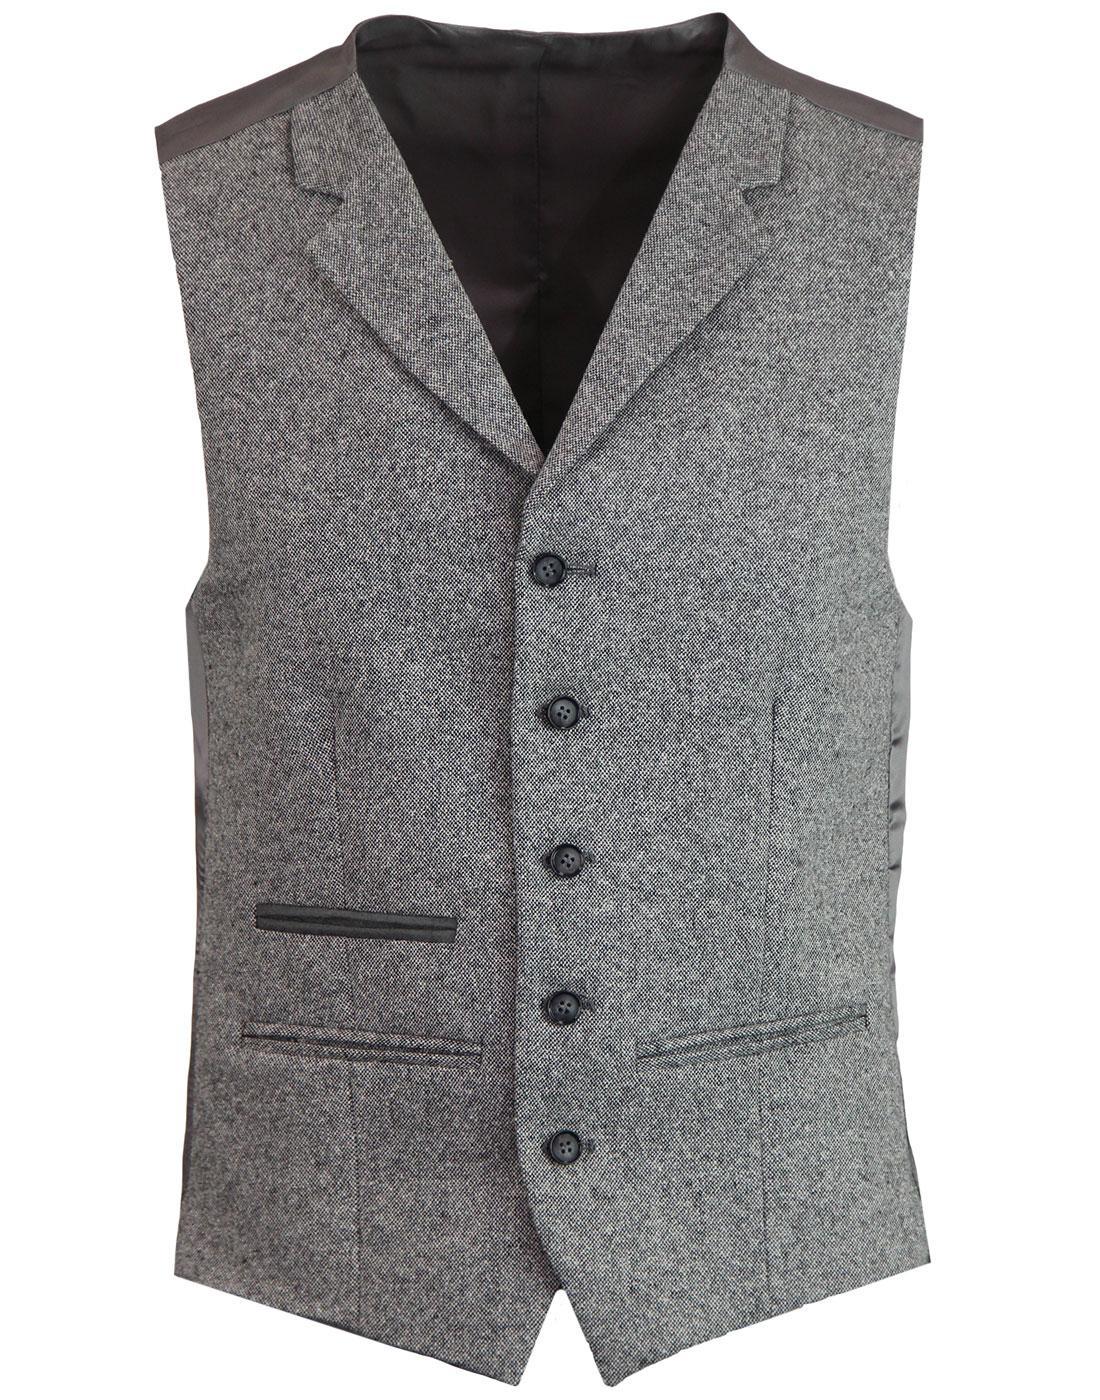 Retro 60s Mod Donegal Fleck Lapel Waistcoat SILVER